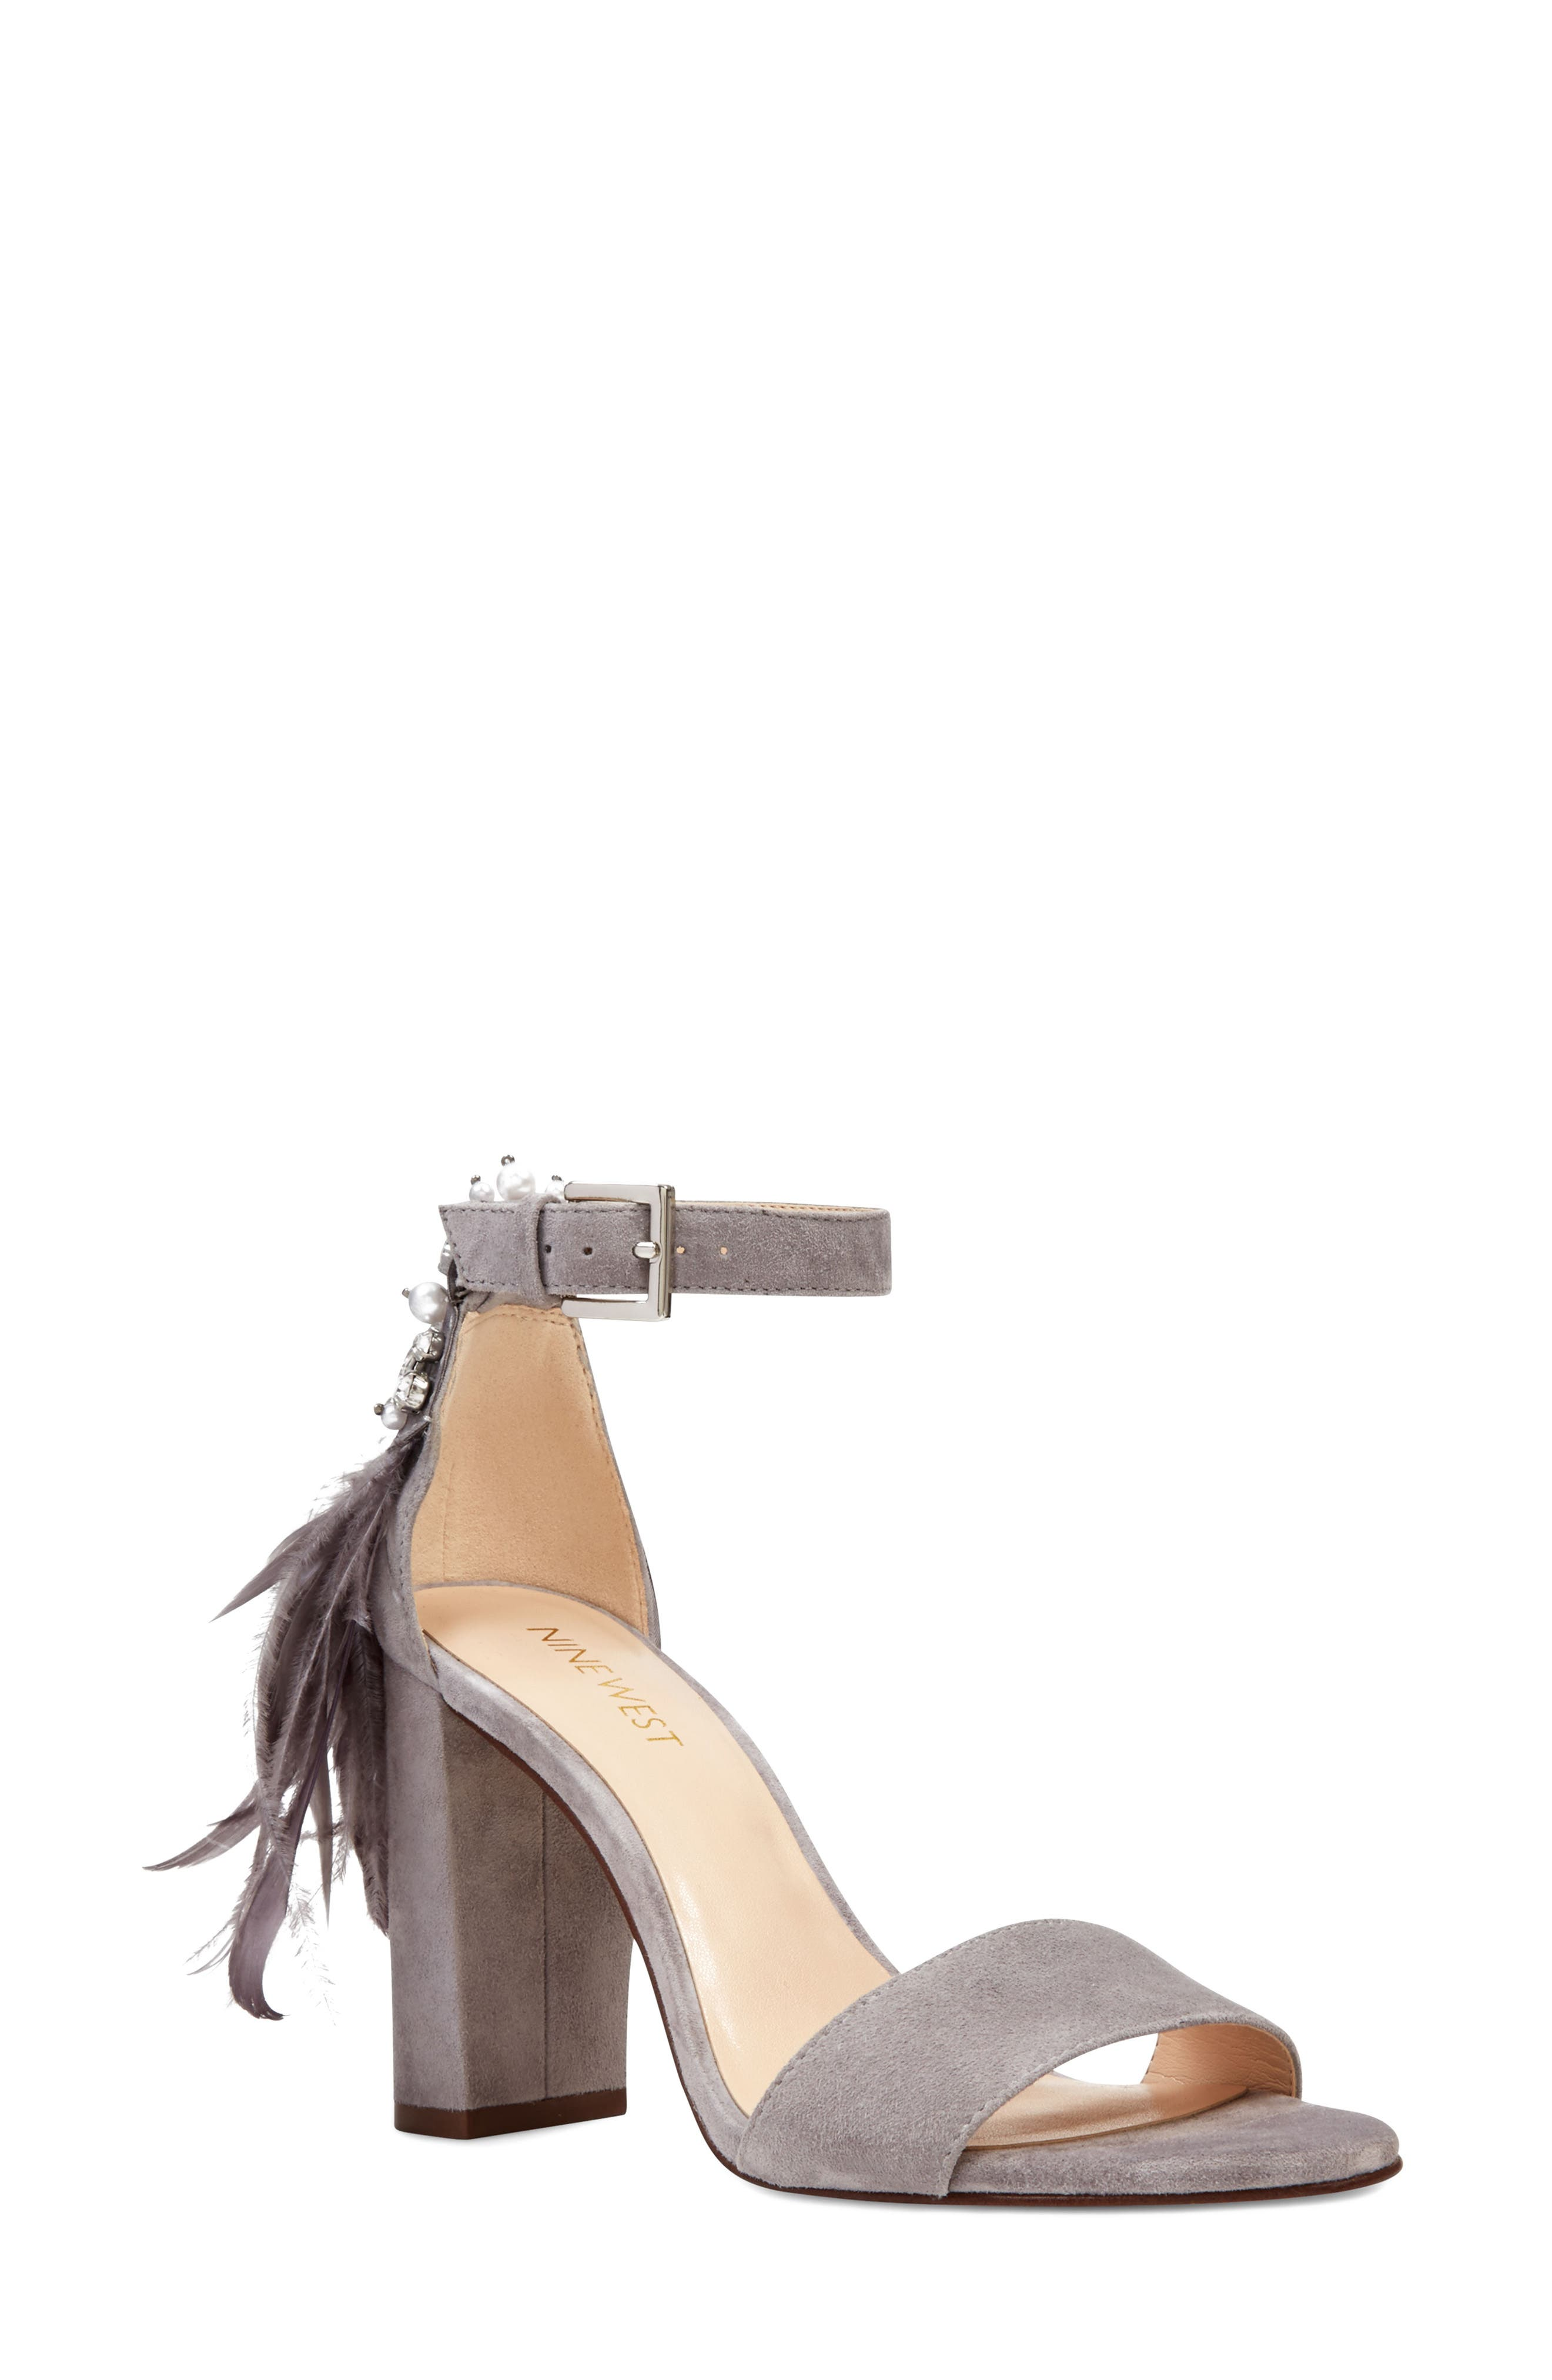 Aaronita Feather Block Heel Sandal,                         Main,                         color, Grey Suede